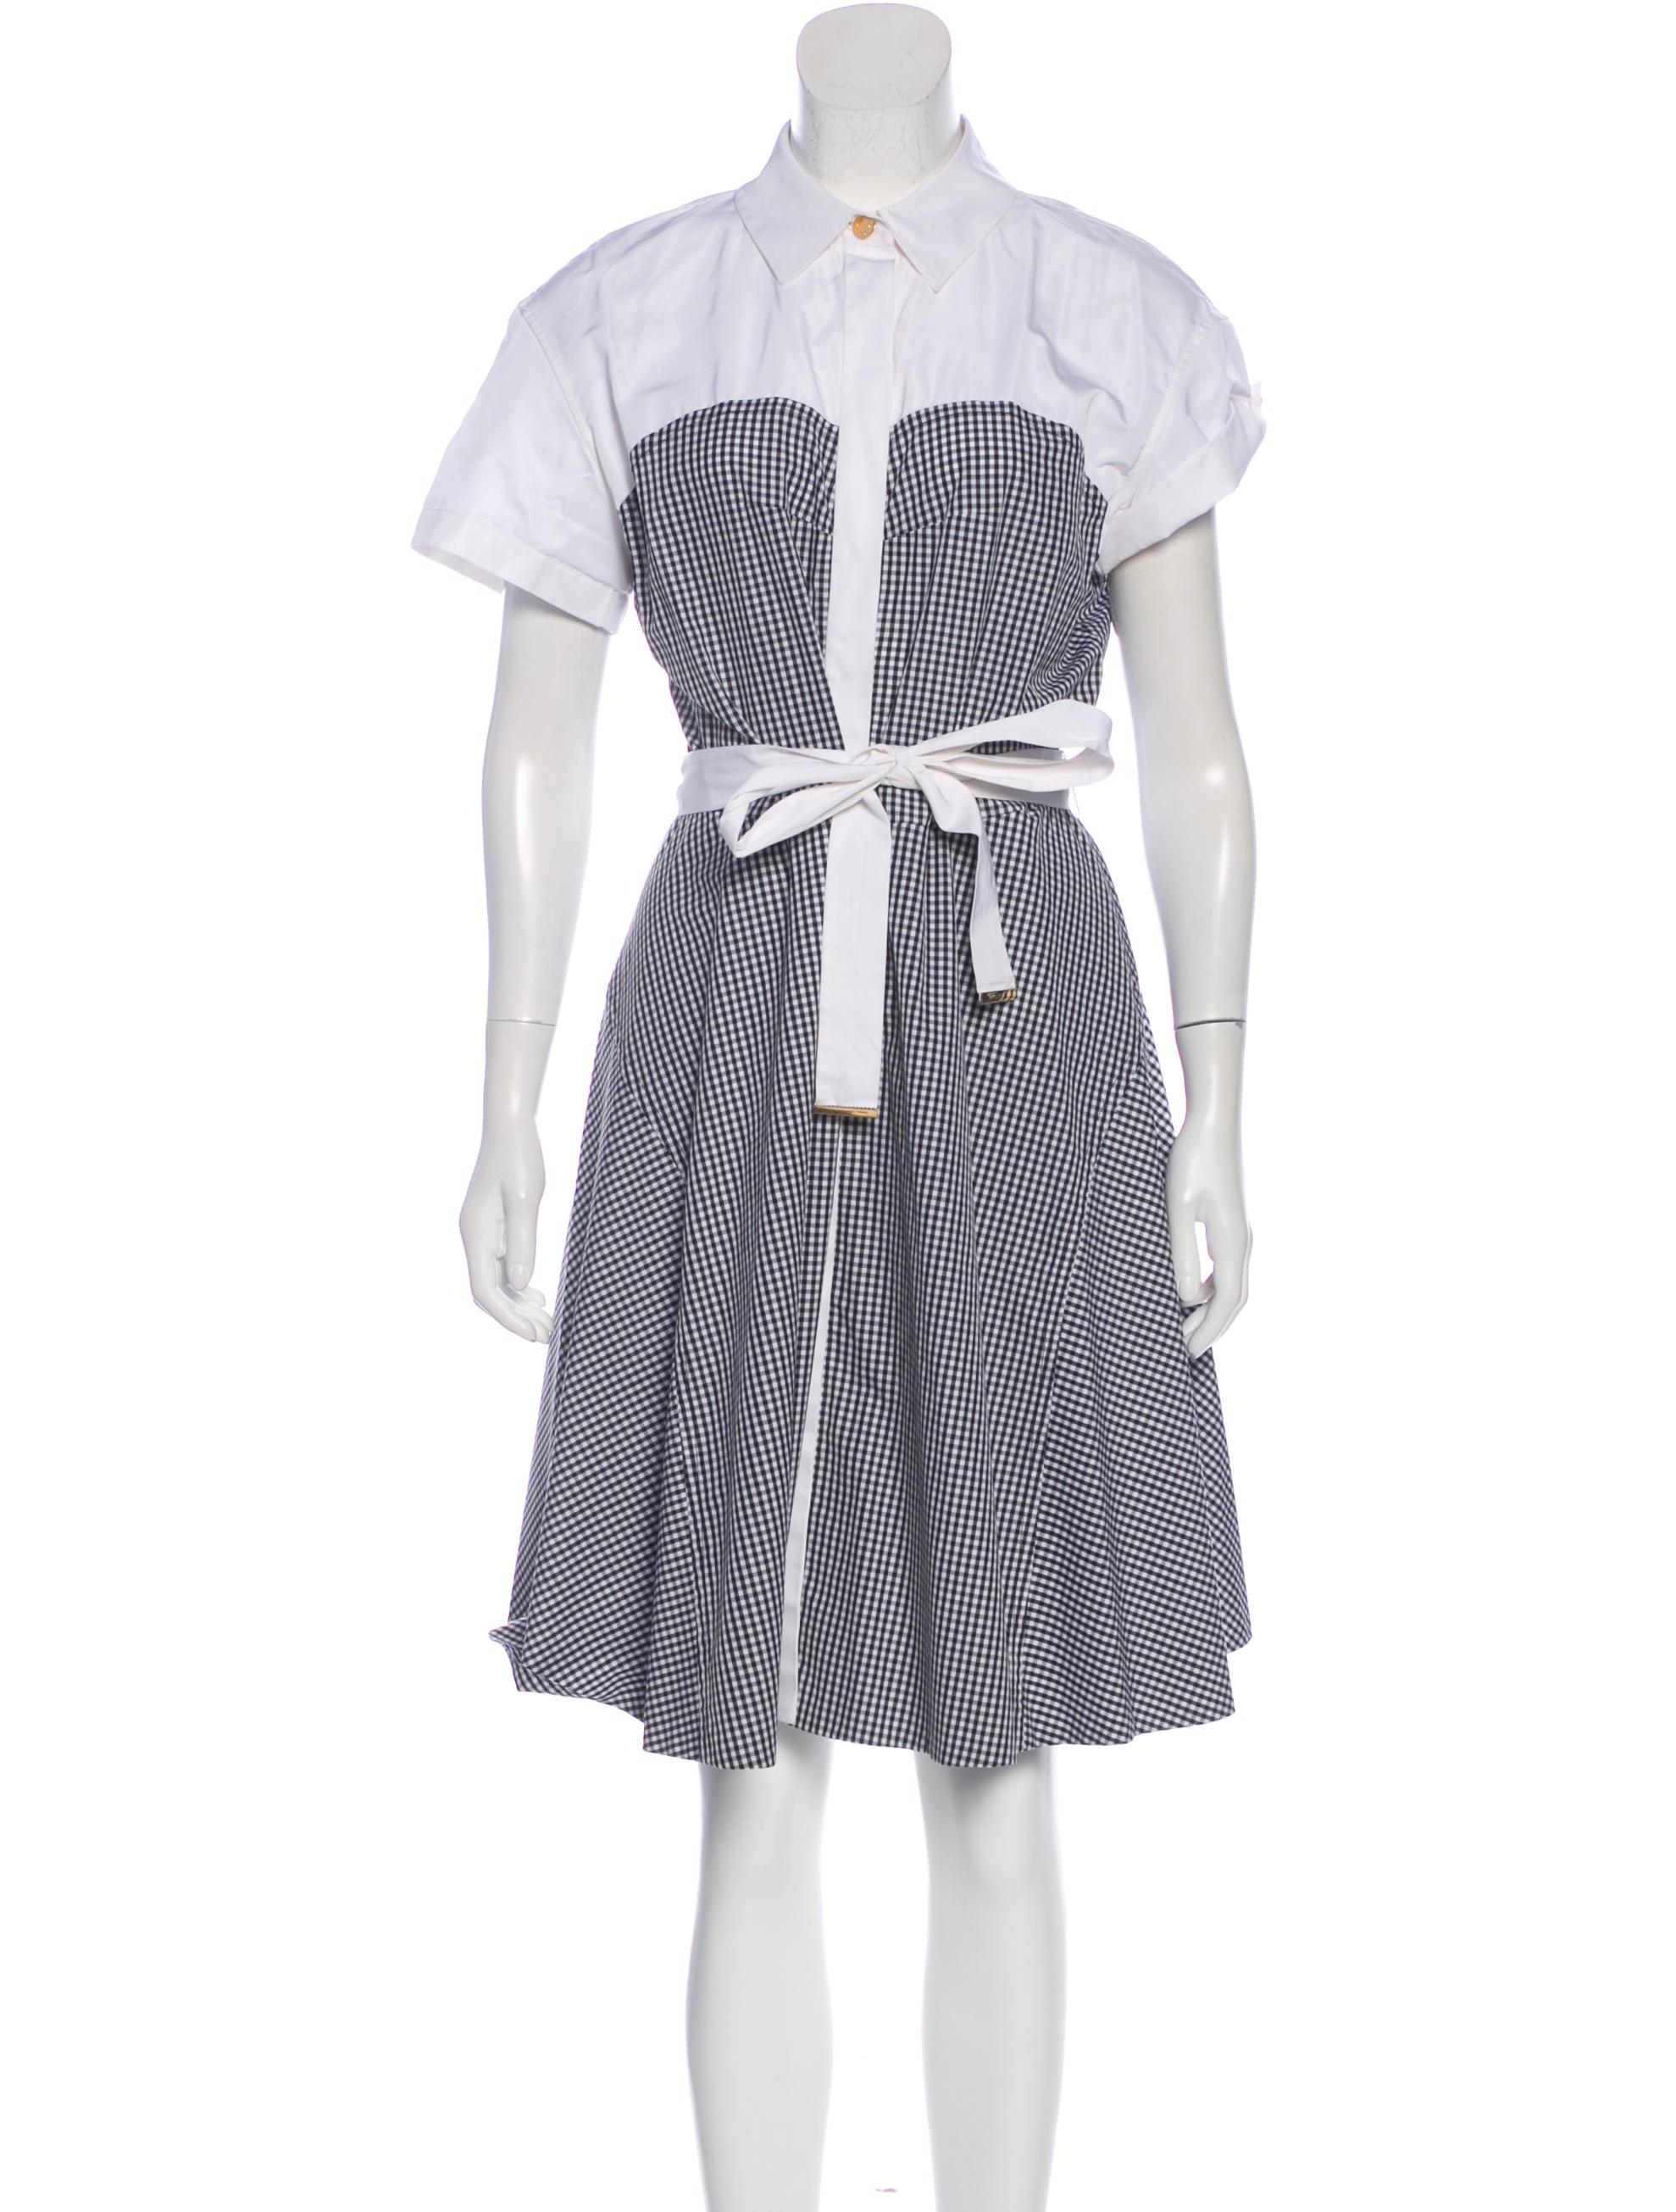 a2054b2b8c7bf Louis Vuitton Gingham Midi Dress w  Tags - Clothing - LOU195998 ...